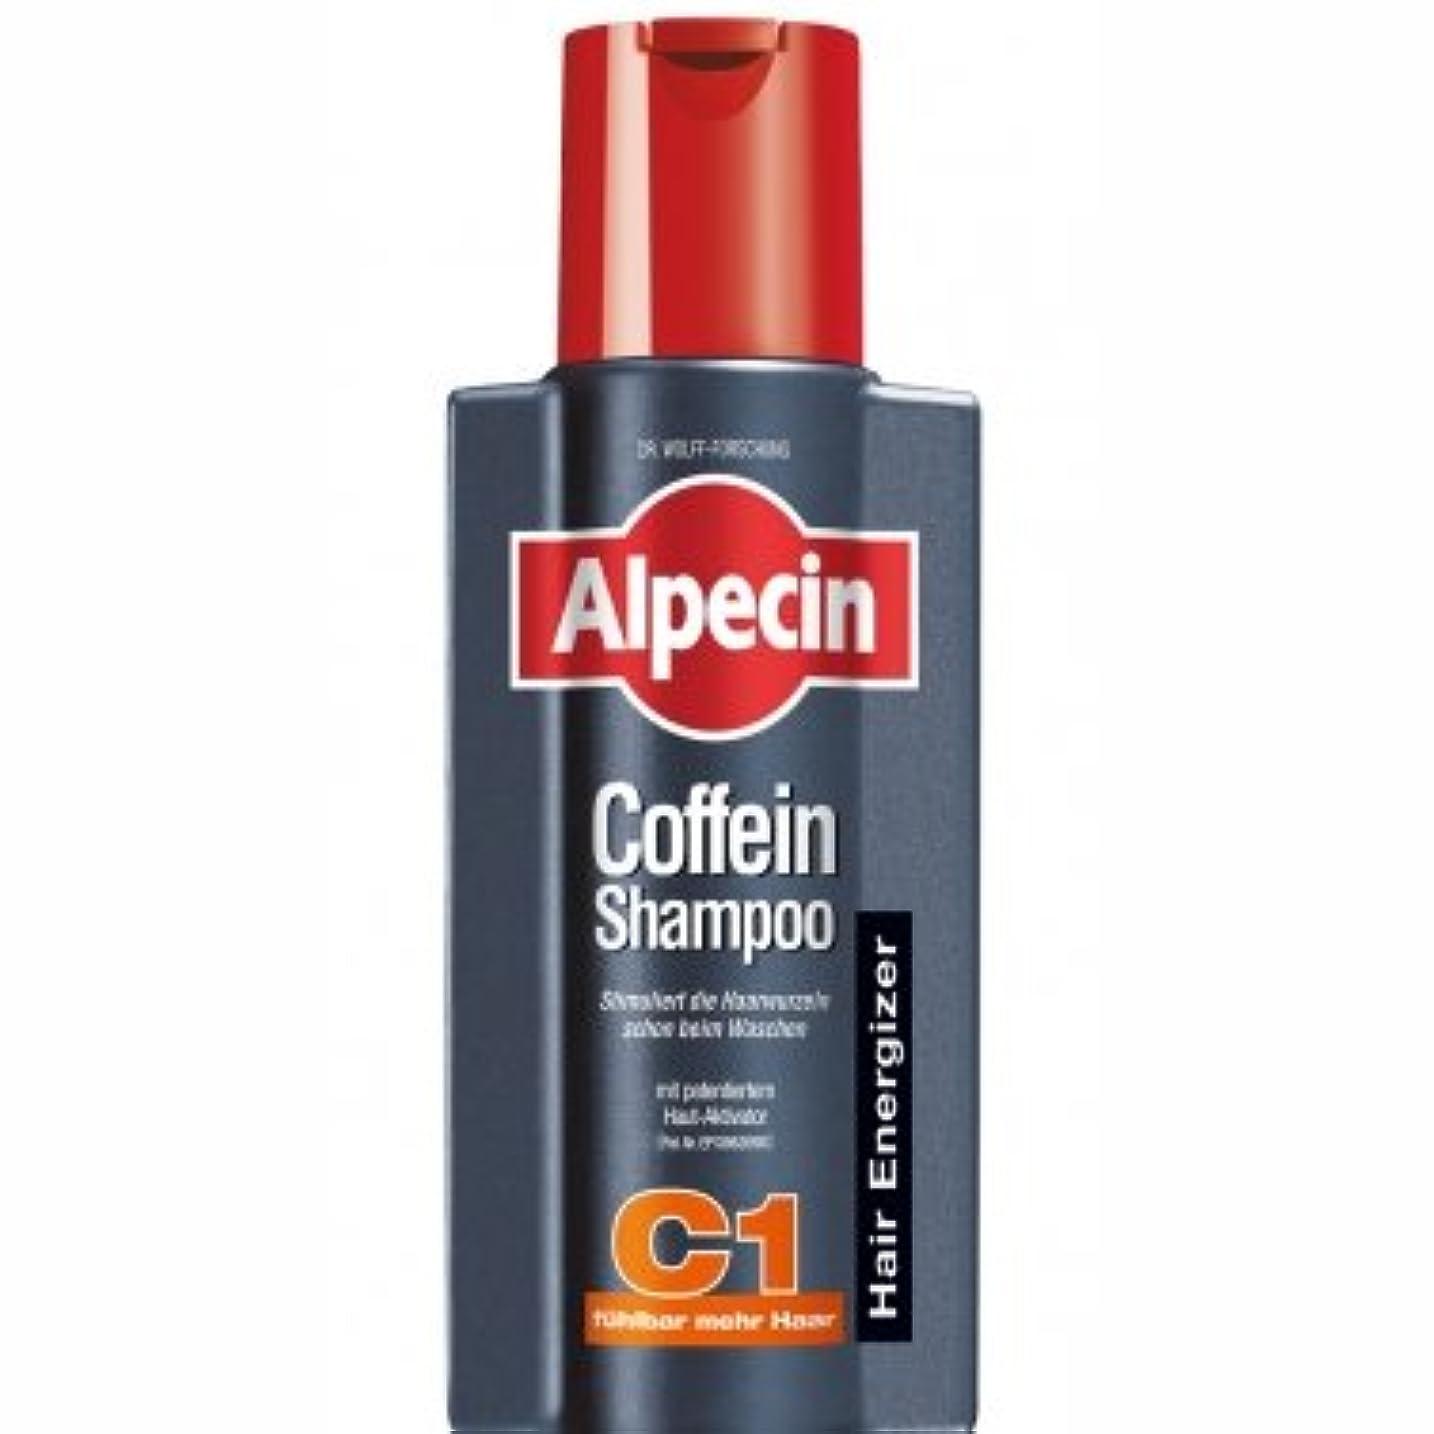 ALPECIN オーガニックシャンプー カフェインシャンプーC1 250ml【並行輸入品】